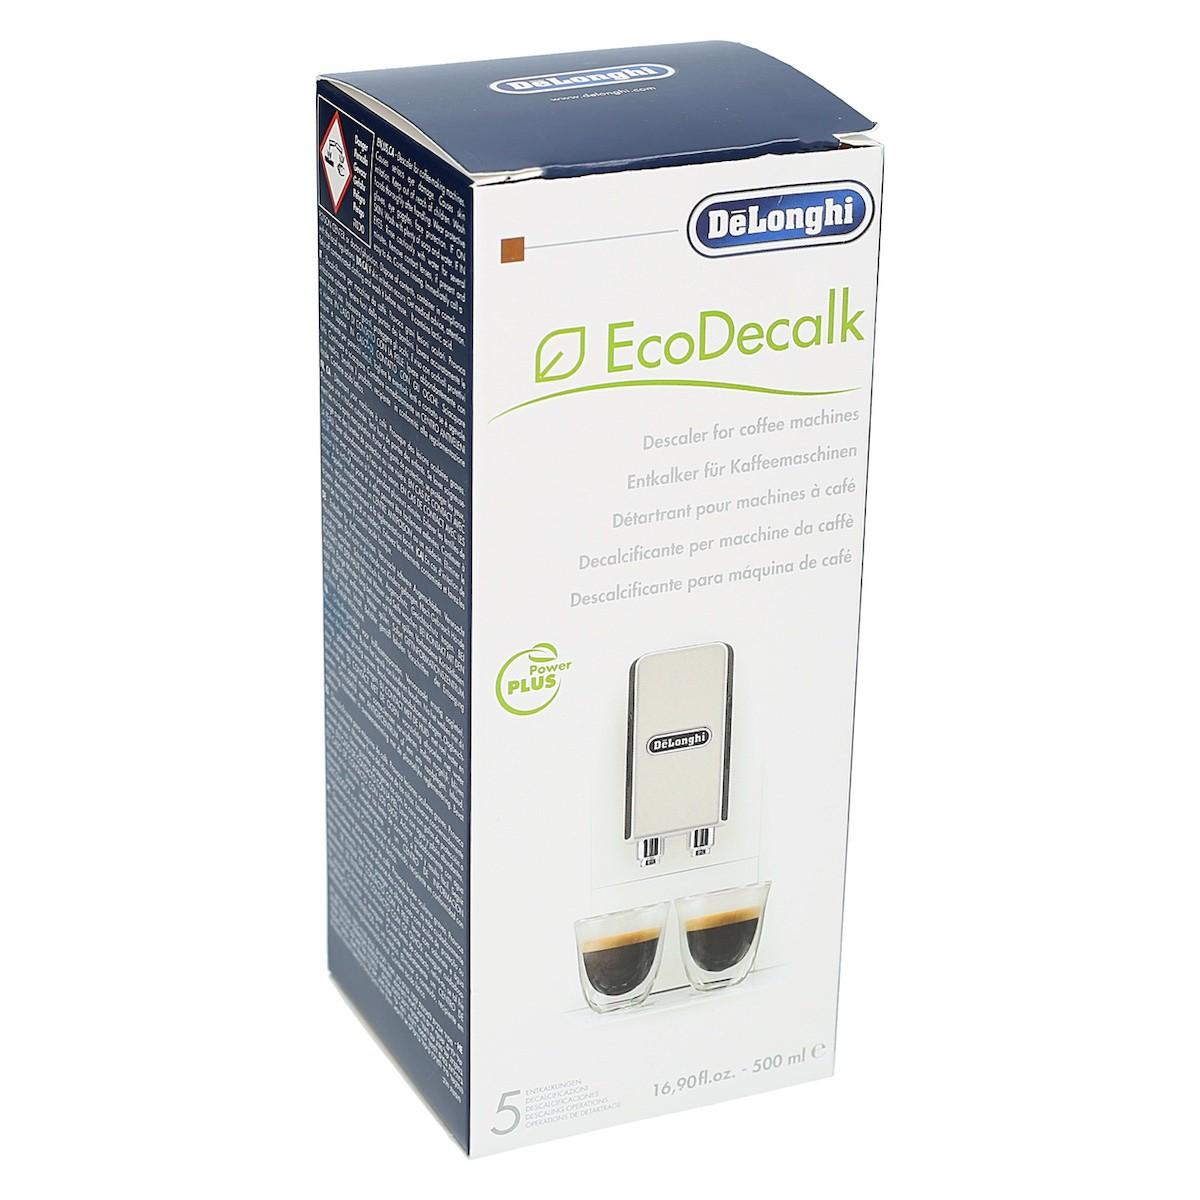 Odvápňovač pre kávovary DeLonghi EcoDecalk 500ml megamix.sk